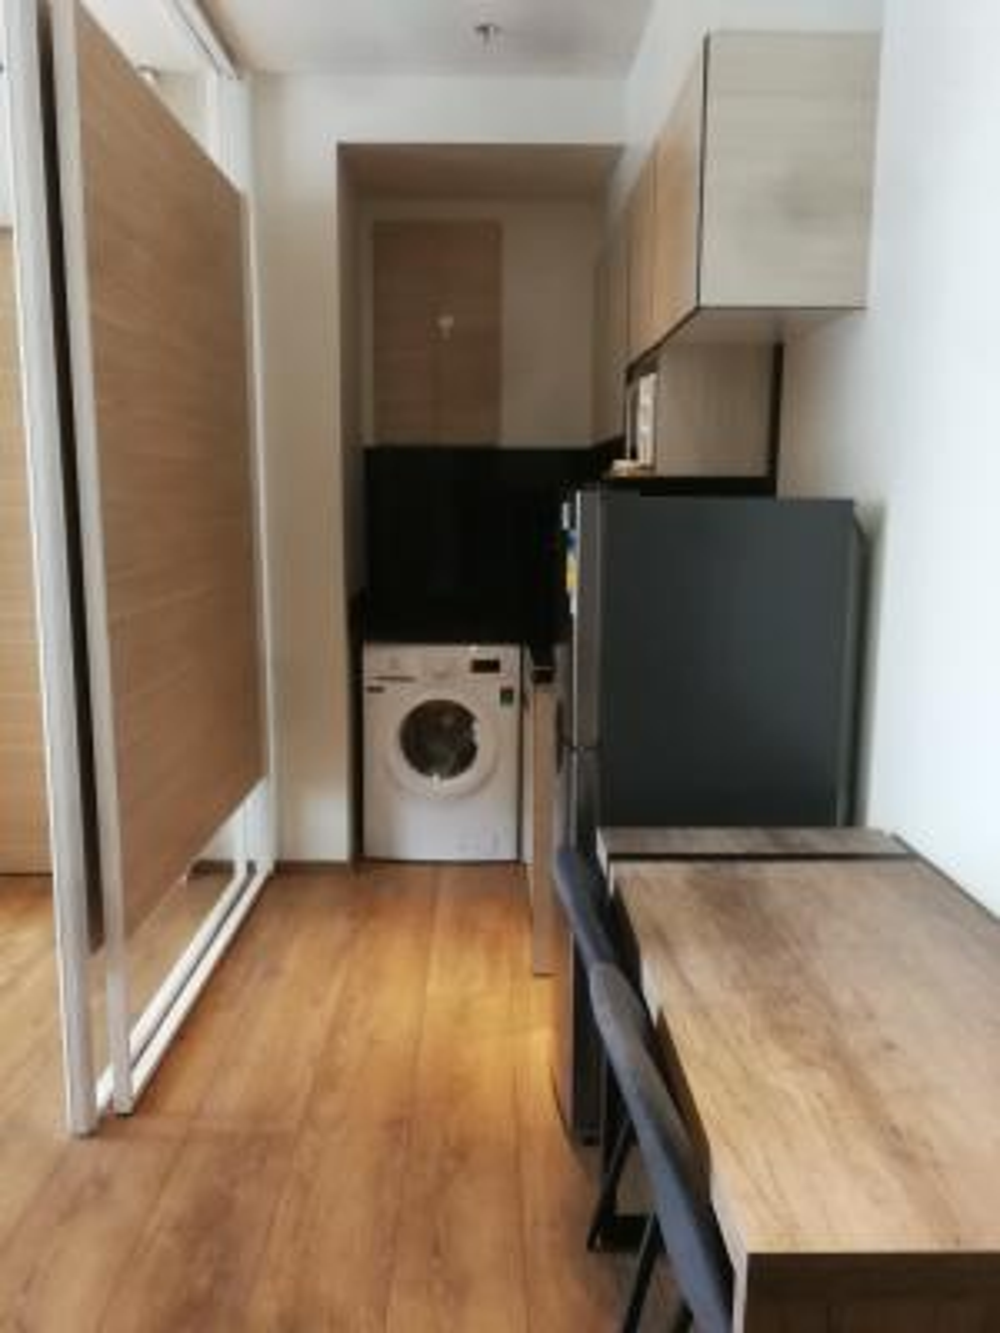 For SaleCondoSukhumvit, Asoke, Thonglor : Sell 1 bedroom, size 33.85 Tower 3, 4th floor